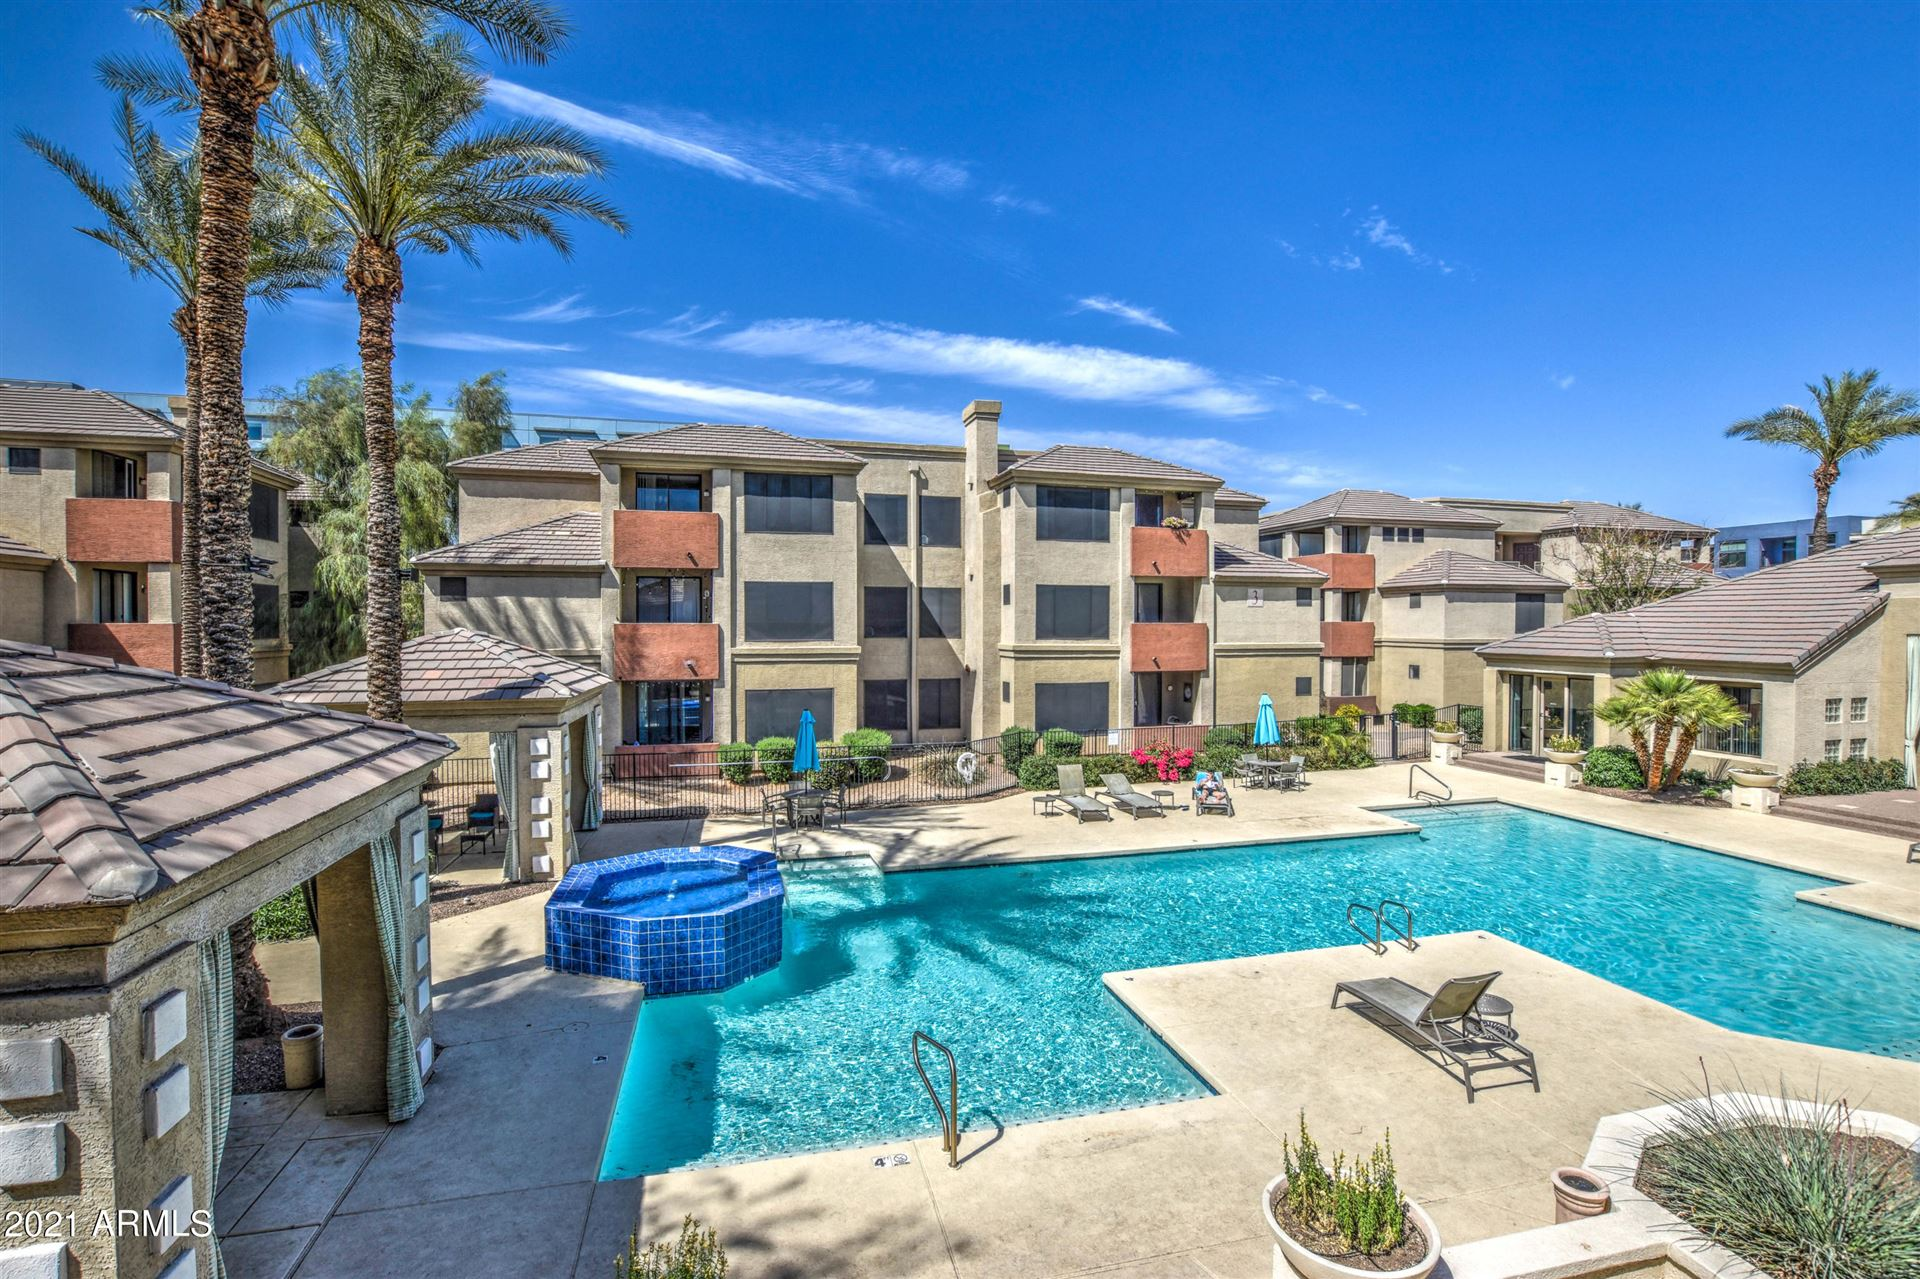 3848 N 3RD Avenue #2089, Phoenix, AZ 85013 - MLS#: 6226515